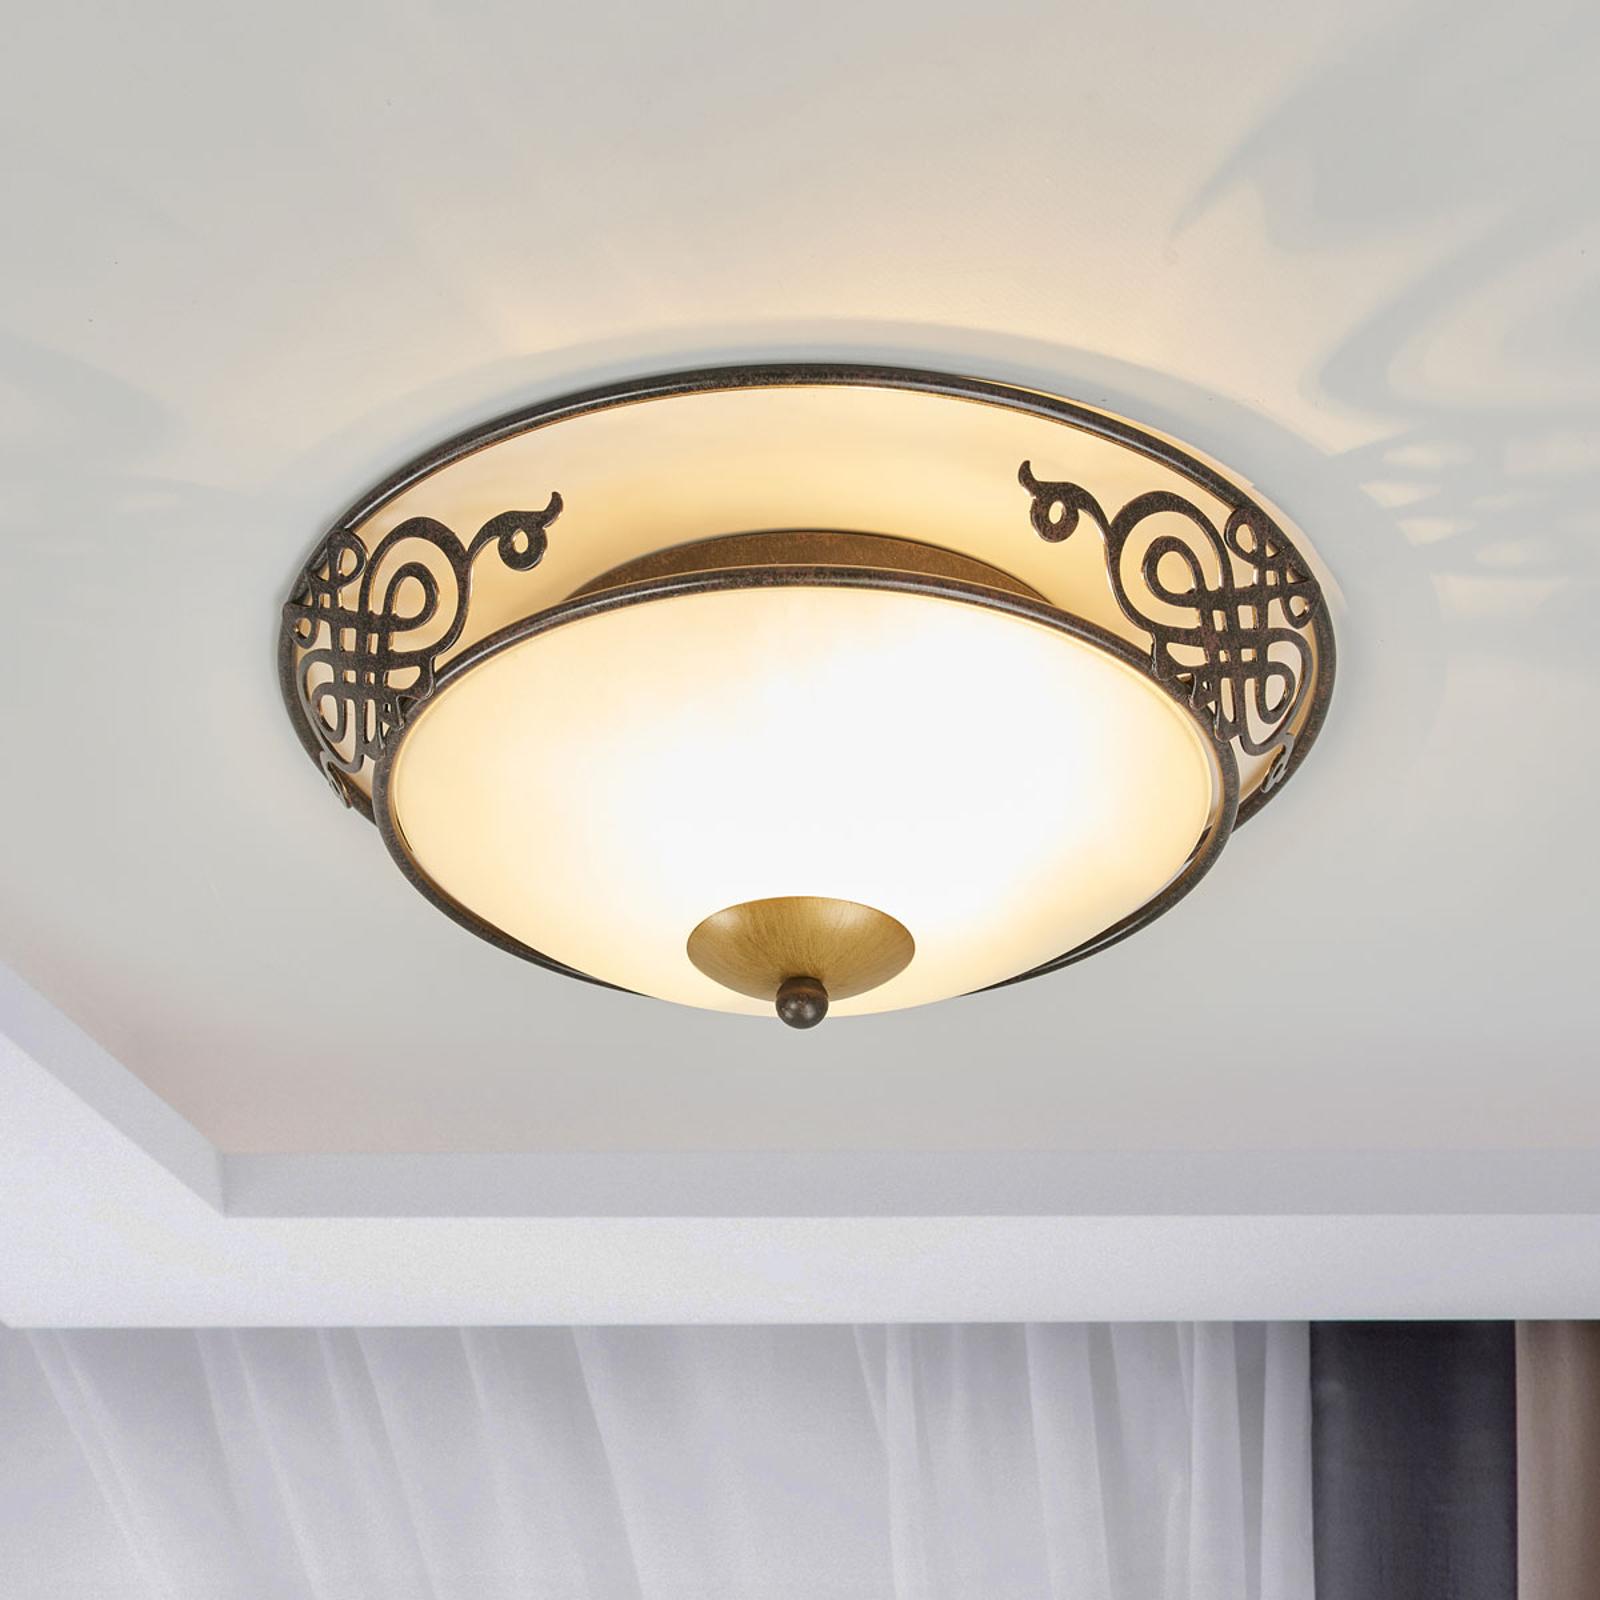 Rustikálne stropné svietidlo Master_3001264_1